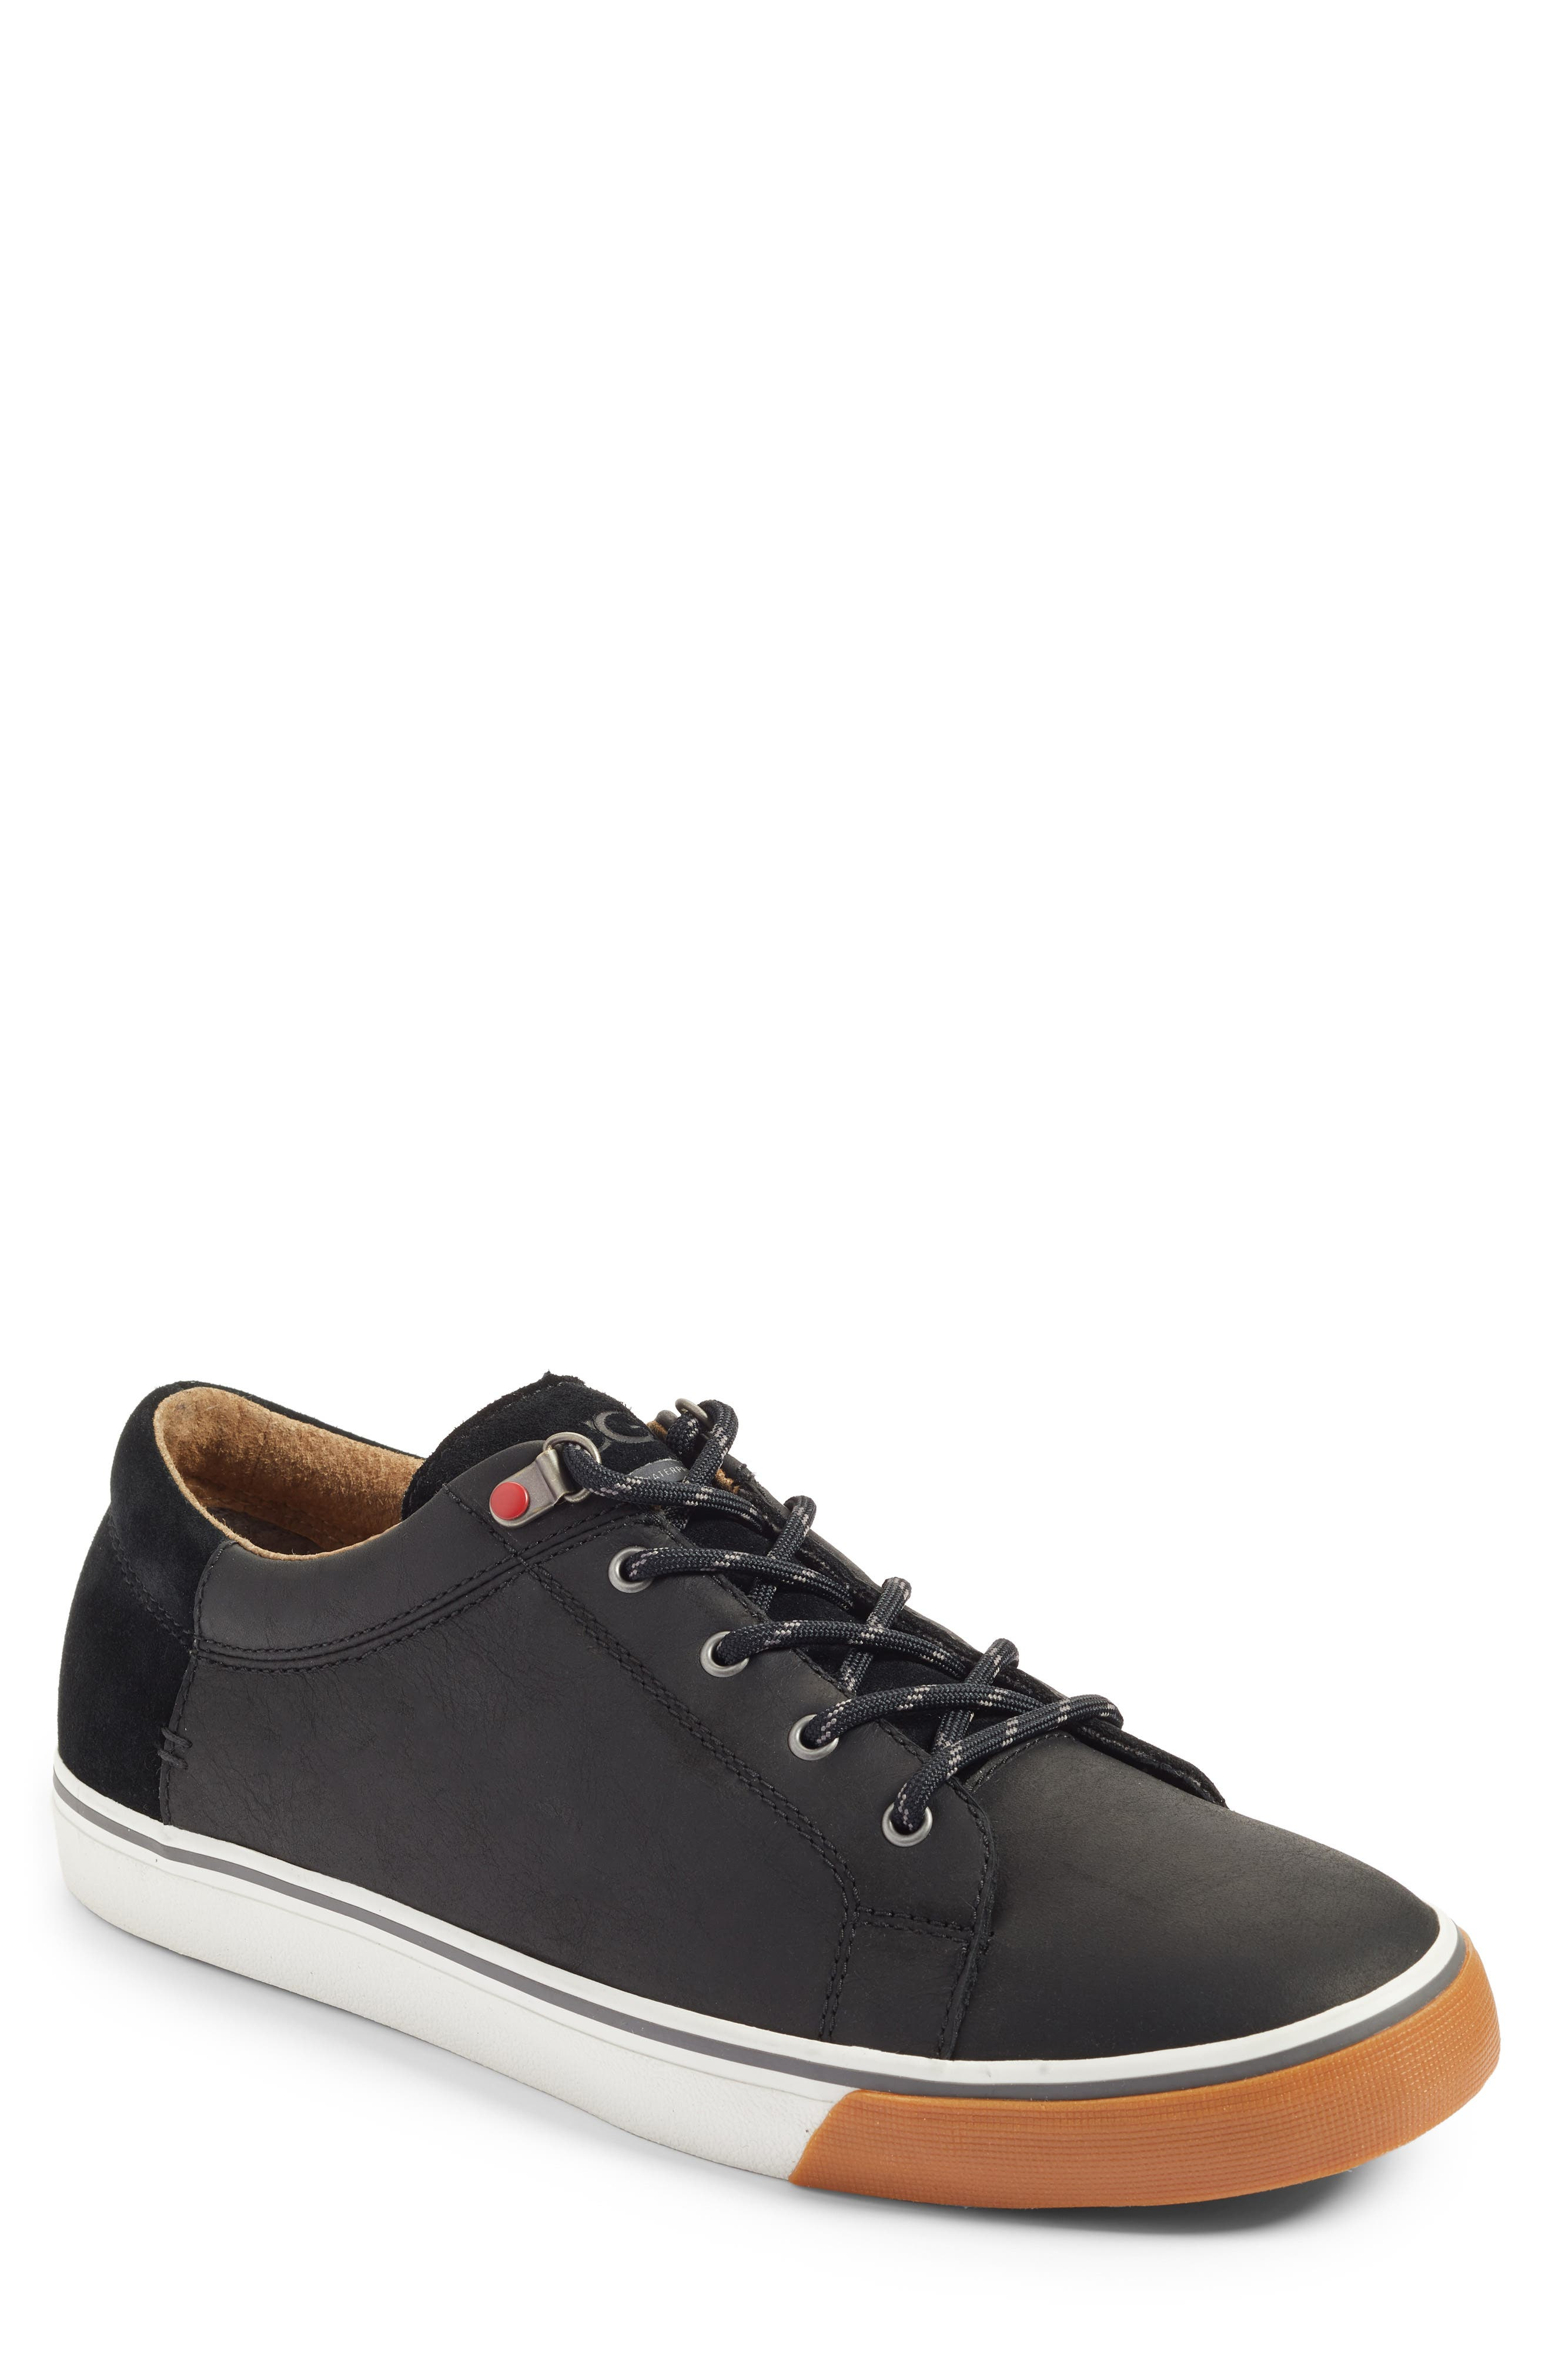 Brock Sneaker,                         Main,                         color, 001